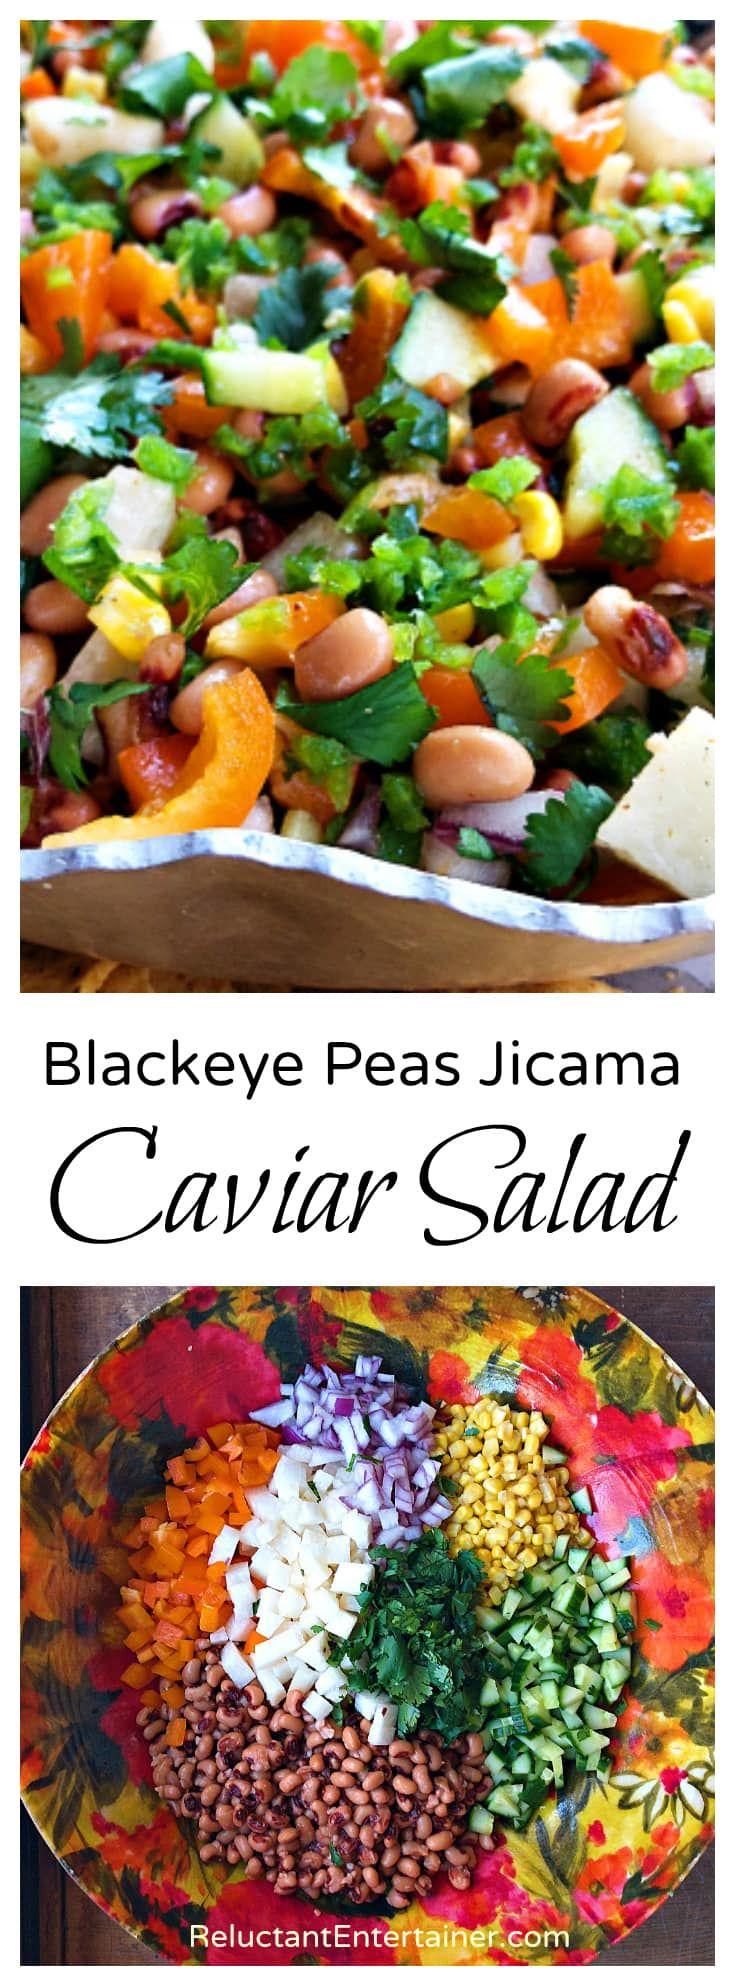 Blackeye peas jicama caviar salad recipe salad recipes